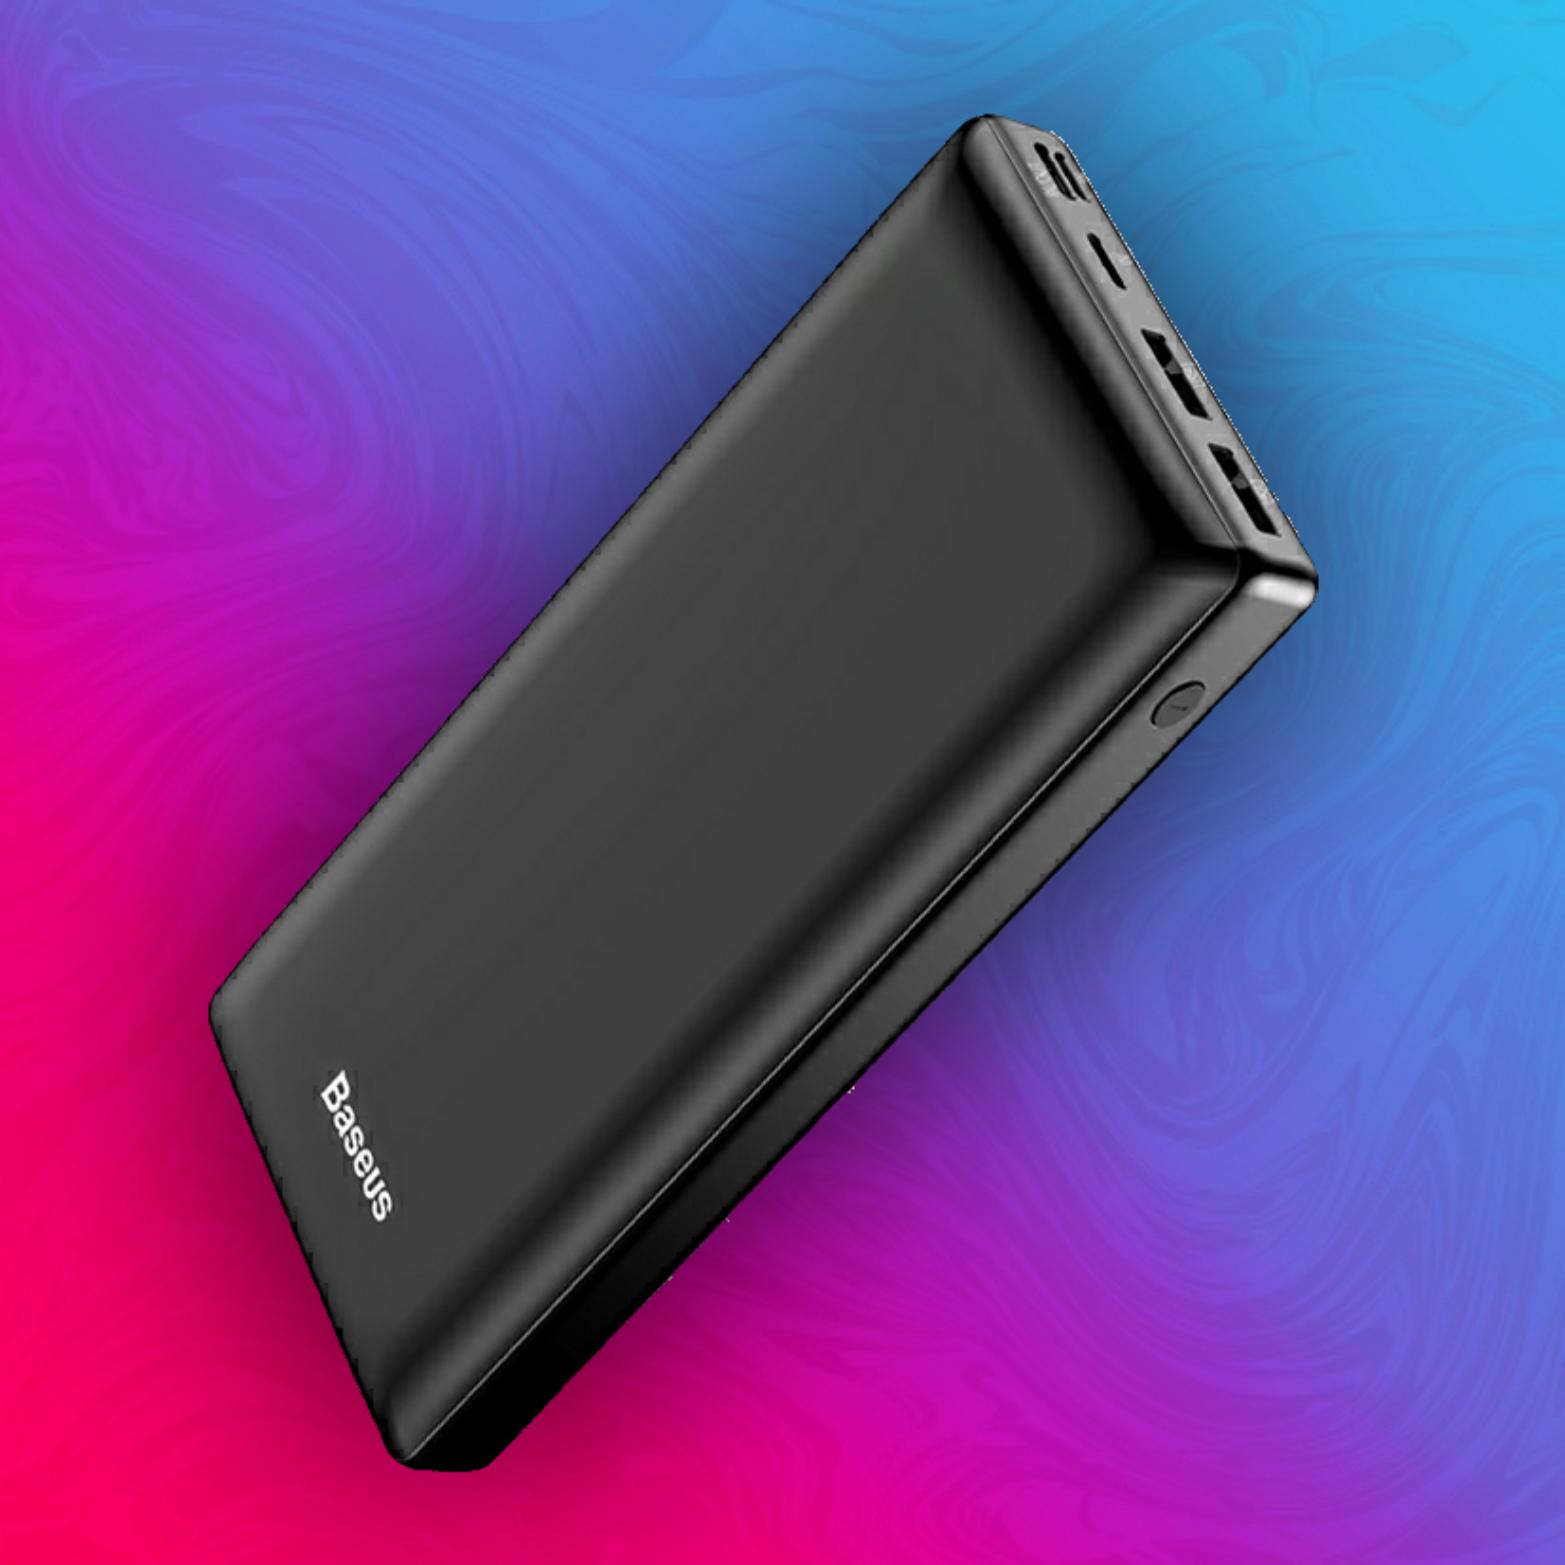 Baseus 30000mAh Powerbank - Power Delivery - 1x Typ C (3A) + 2x USB (2.4A, 1A) - Input: Typ C, Micro USB, Lightning